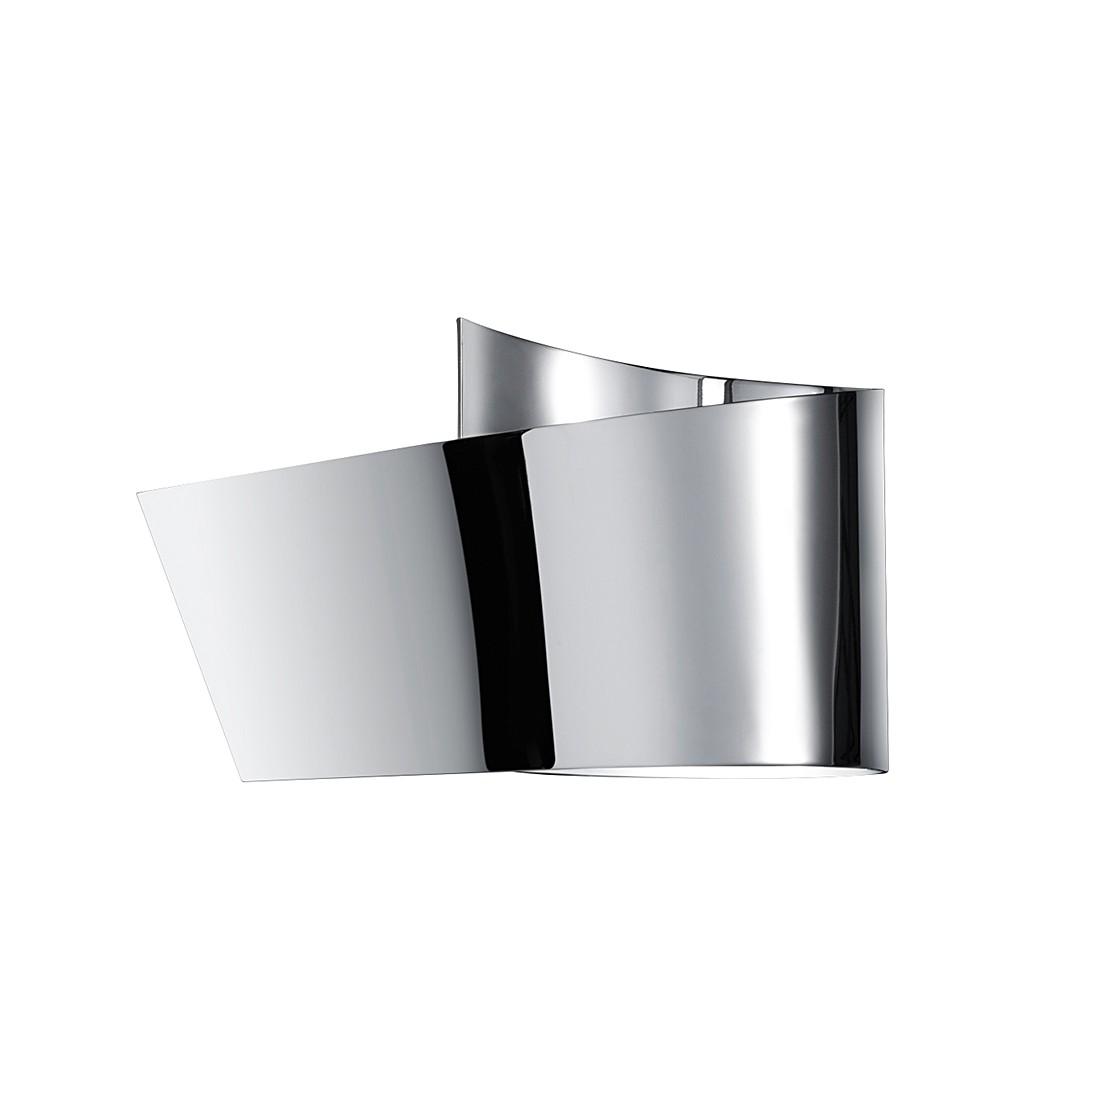 energie  A+, LED-wandlamp - chroomkleurig metaal 1 lichtbron, Trio